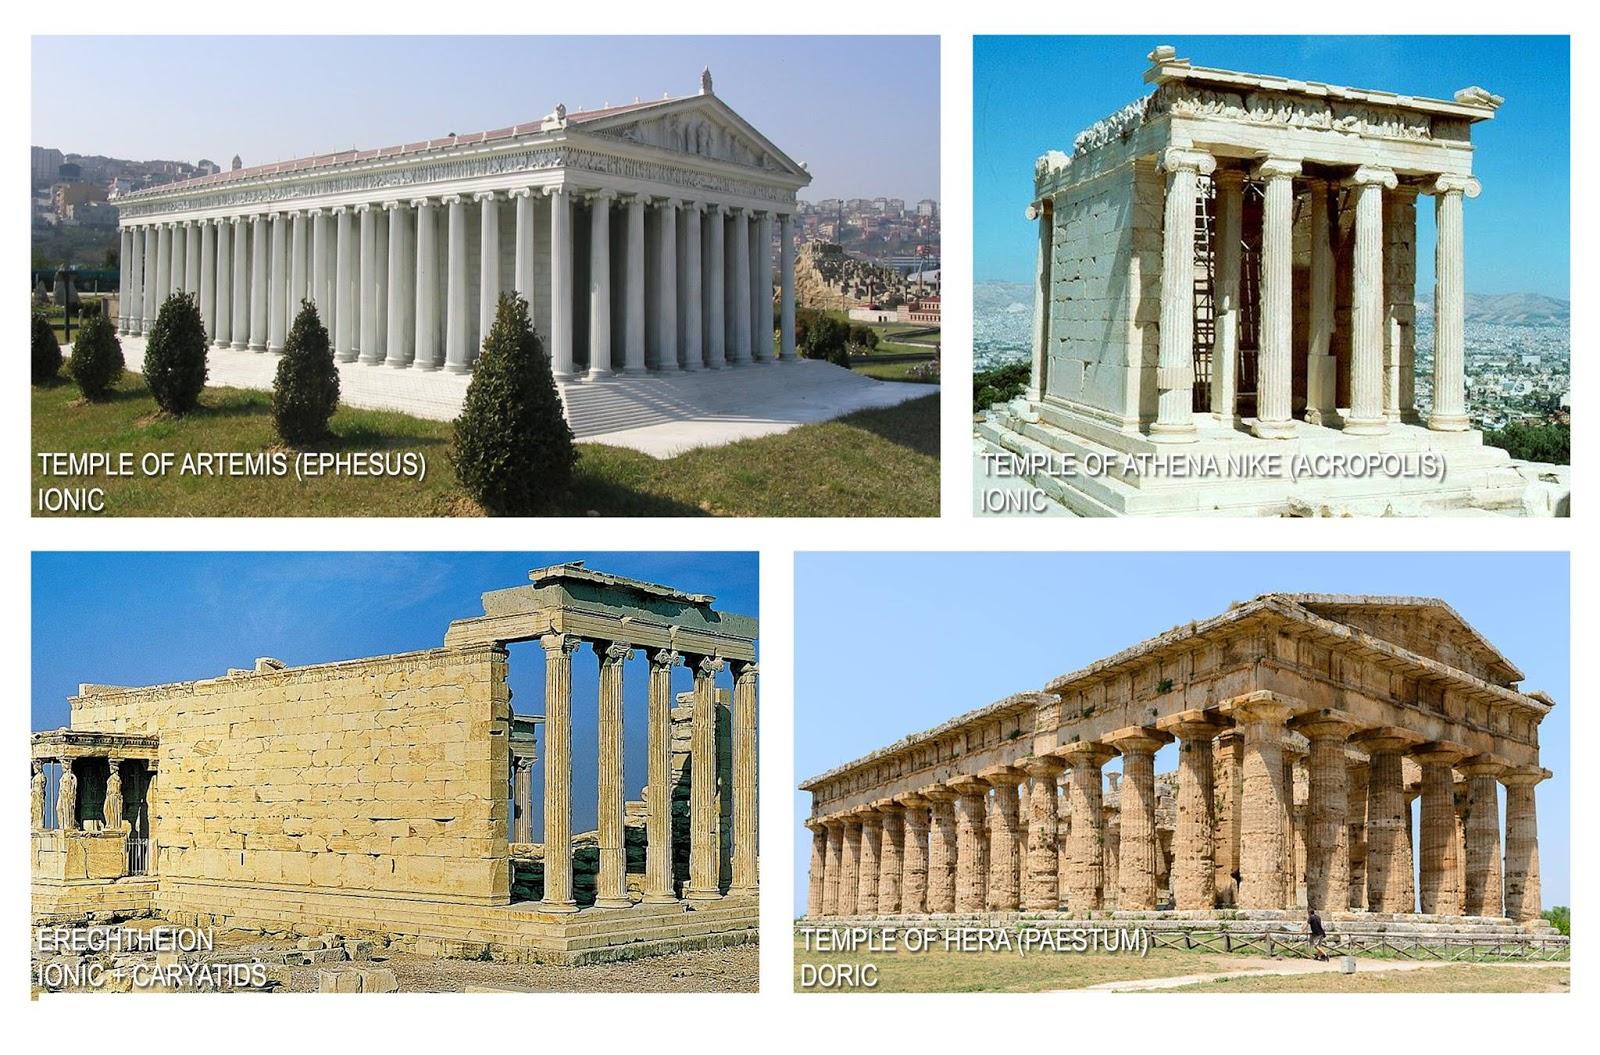 medium resolution of  visit ancient greece com temple of athena nike brothersoft com erechtheion norbert nagel via wikipedia temple of hera paestum